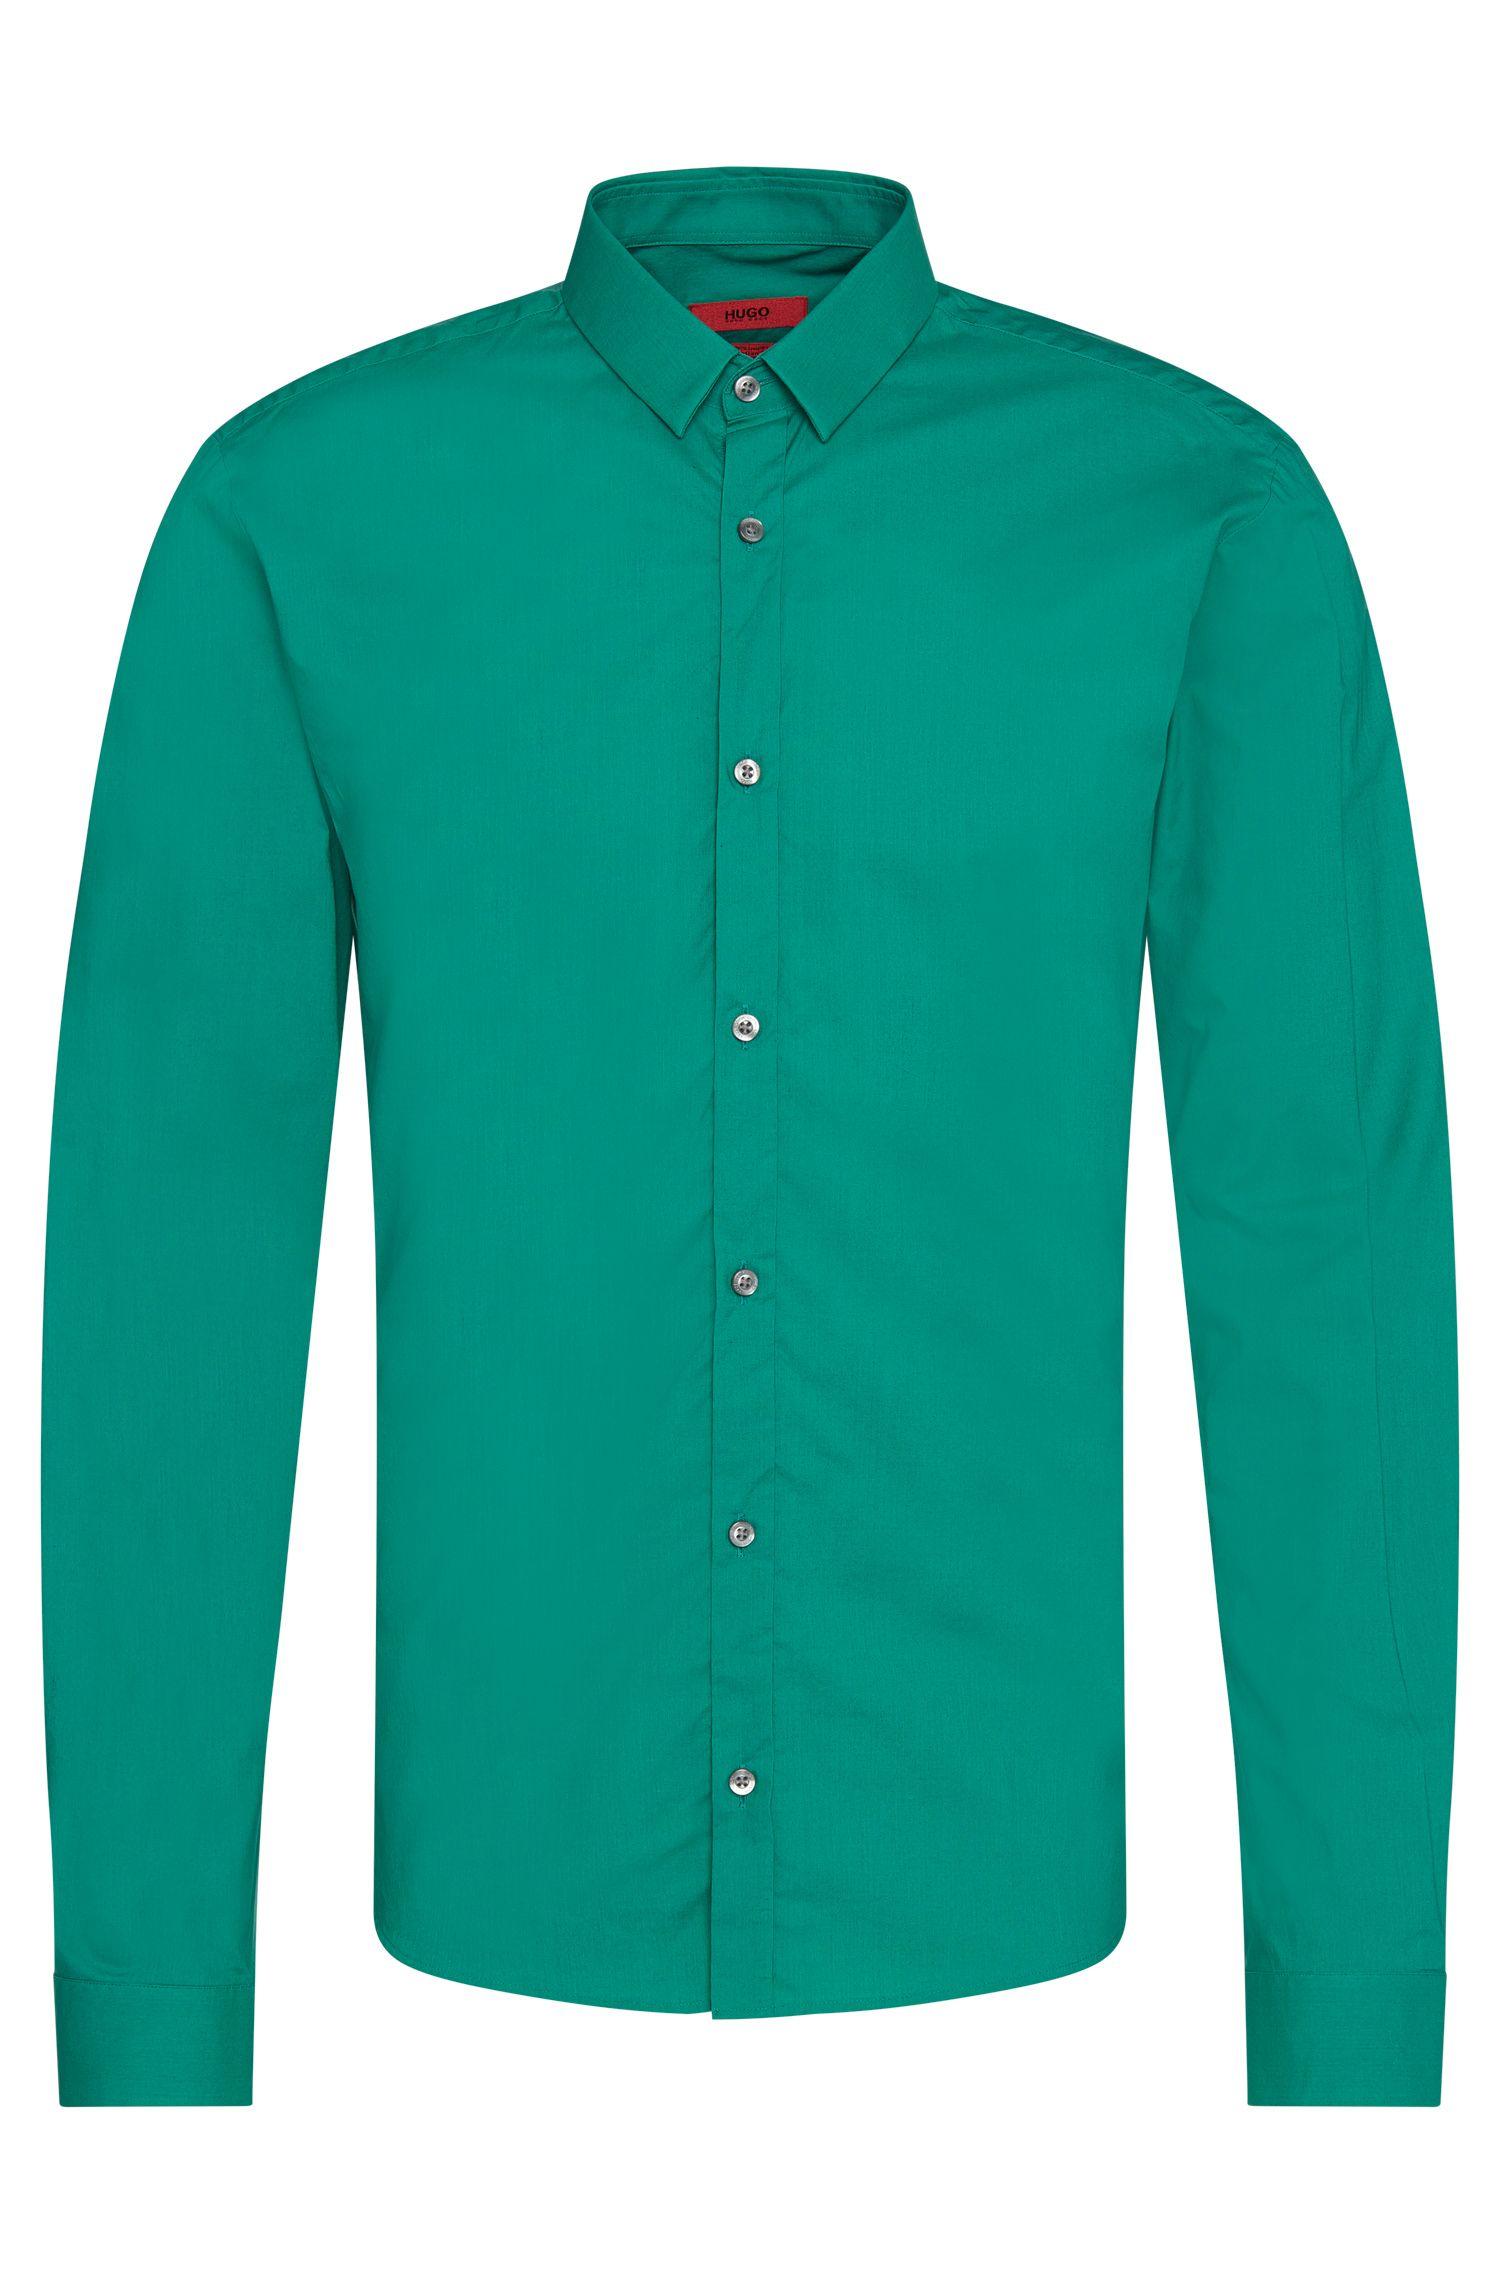 'Ero' | Extra Slim Fit, Cotton Button Down Shirt